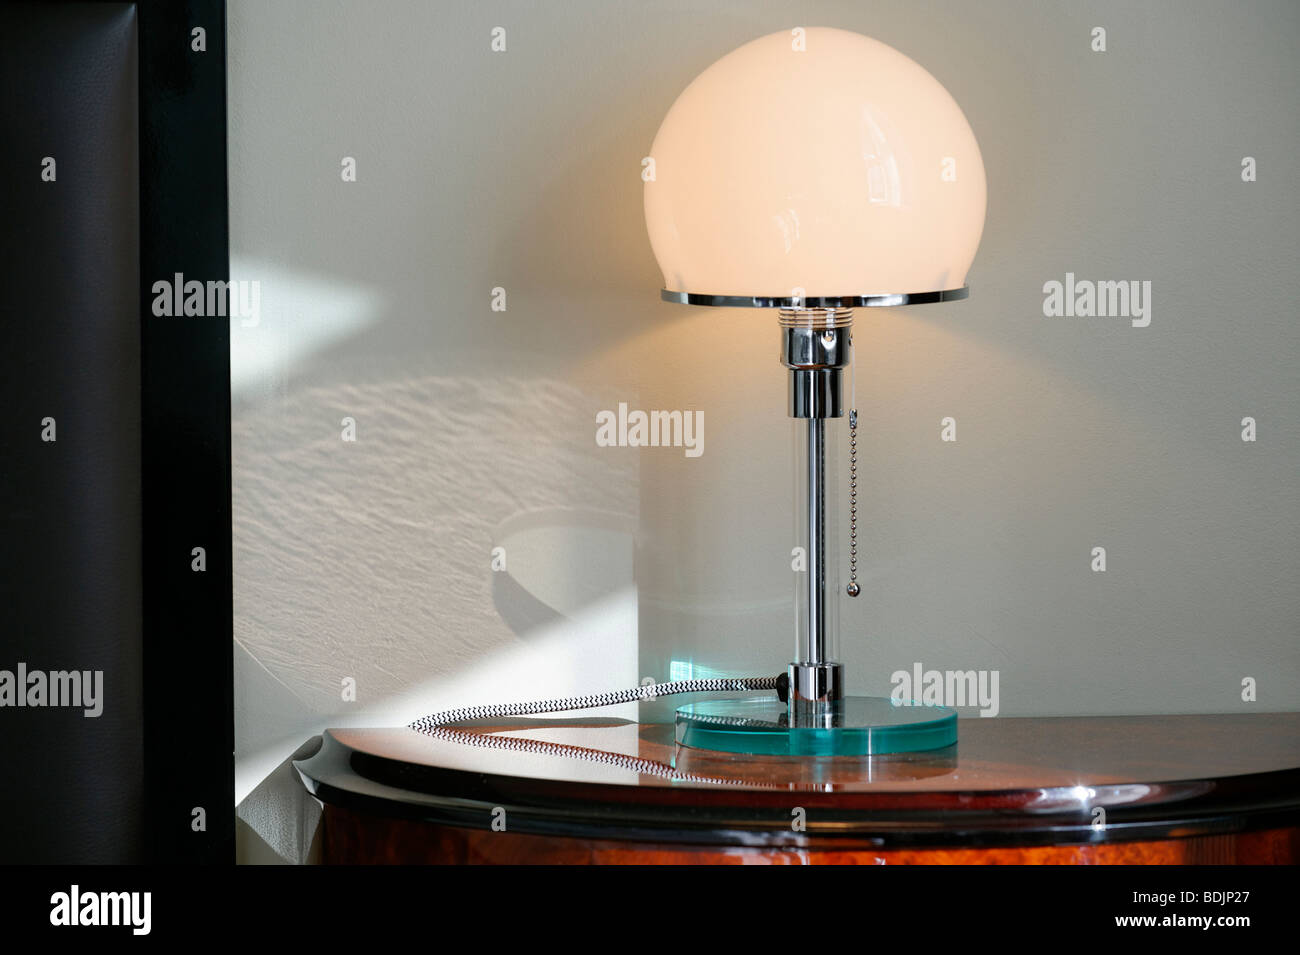 Art deco lampe nachttisch hotel borg reykjavik stockfoto bild